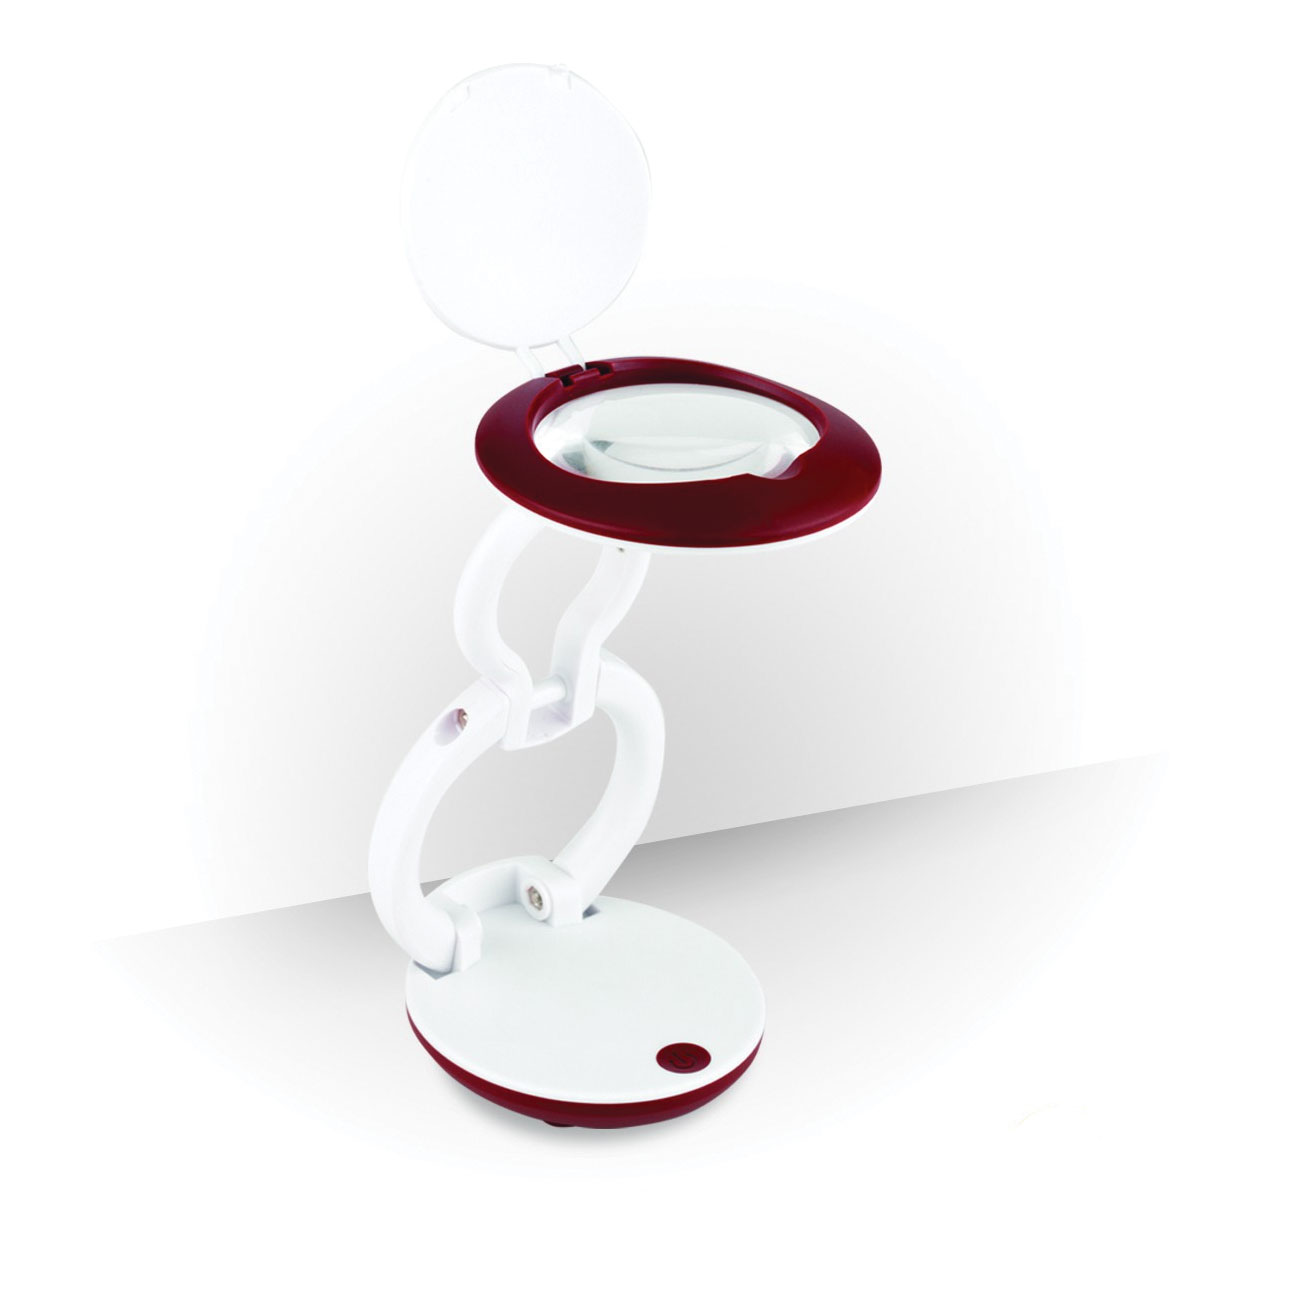 Yoyo Pocket LED Magnifier